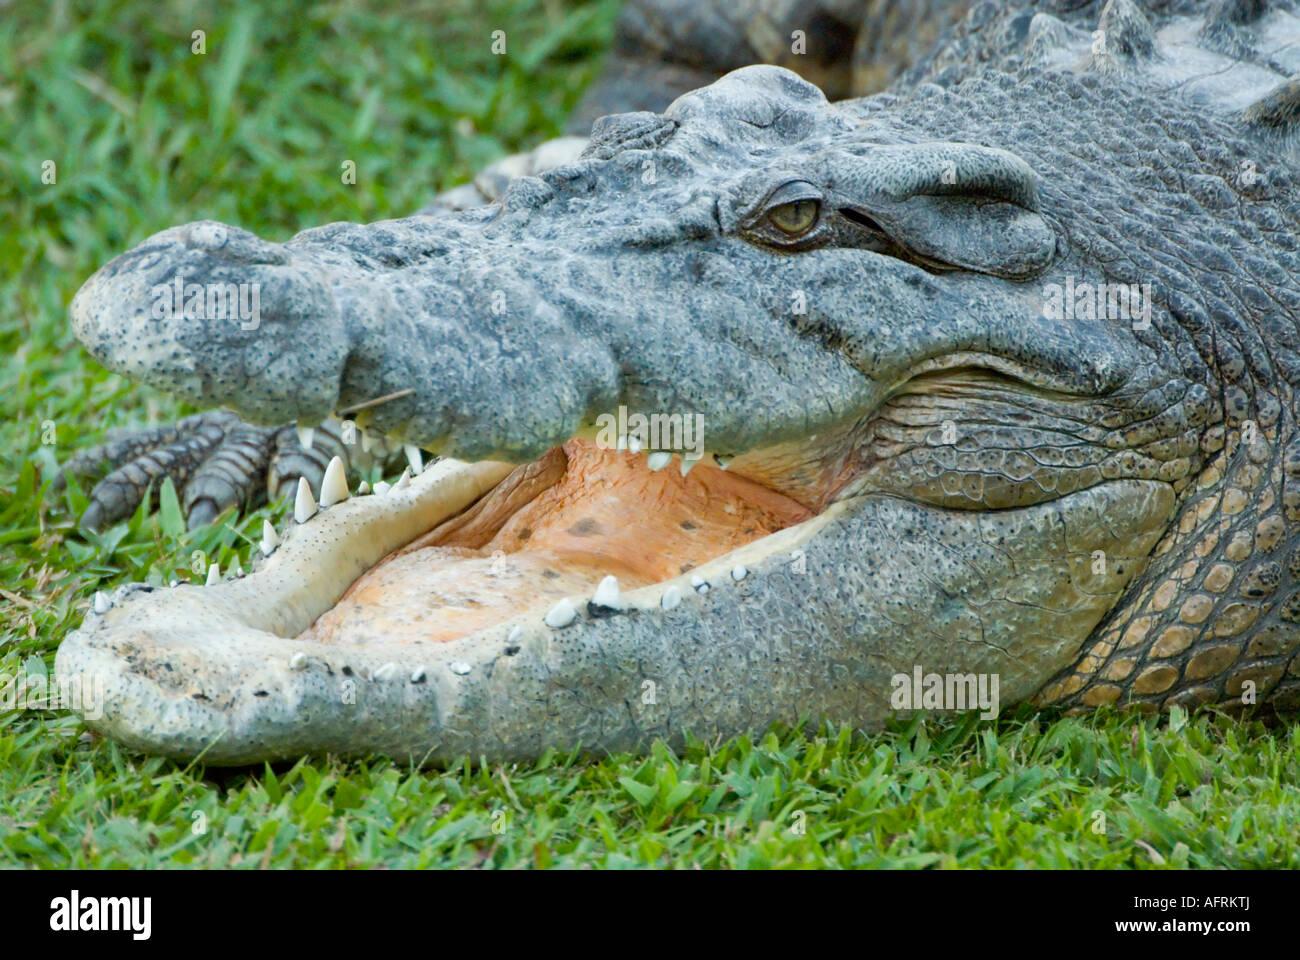 estuarine saltwater crocodile. Photographed in Queensland, Australia. - Stock Image